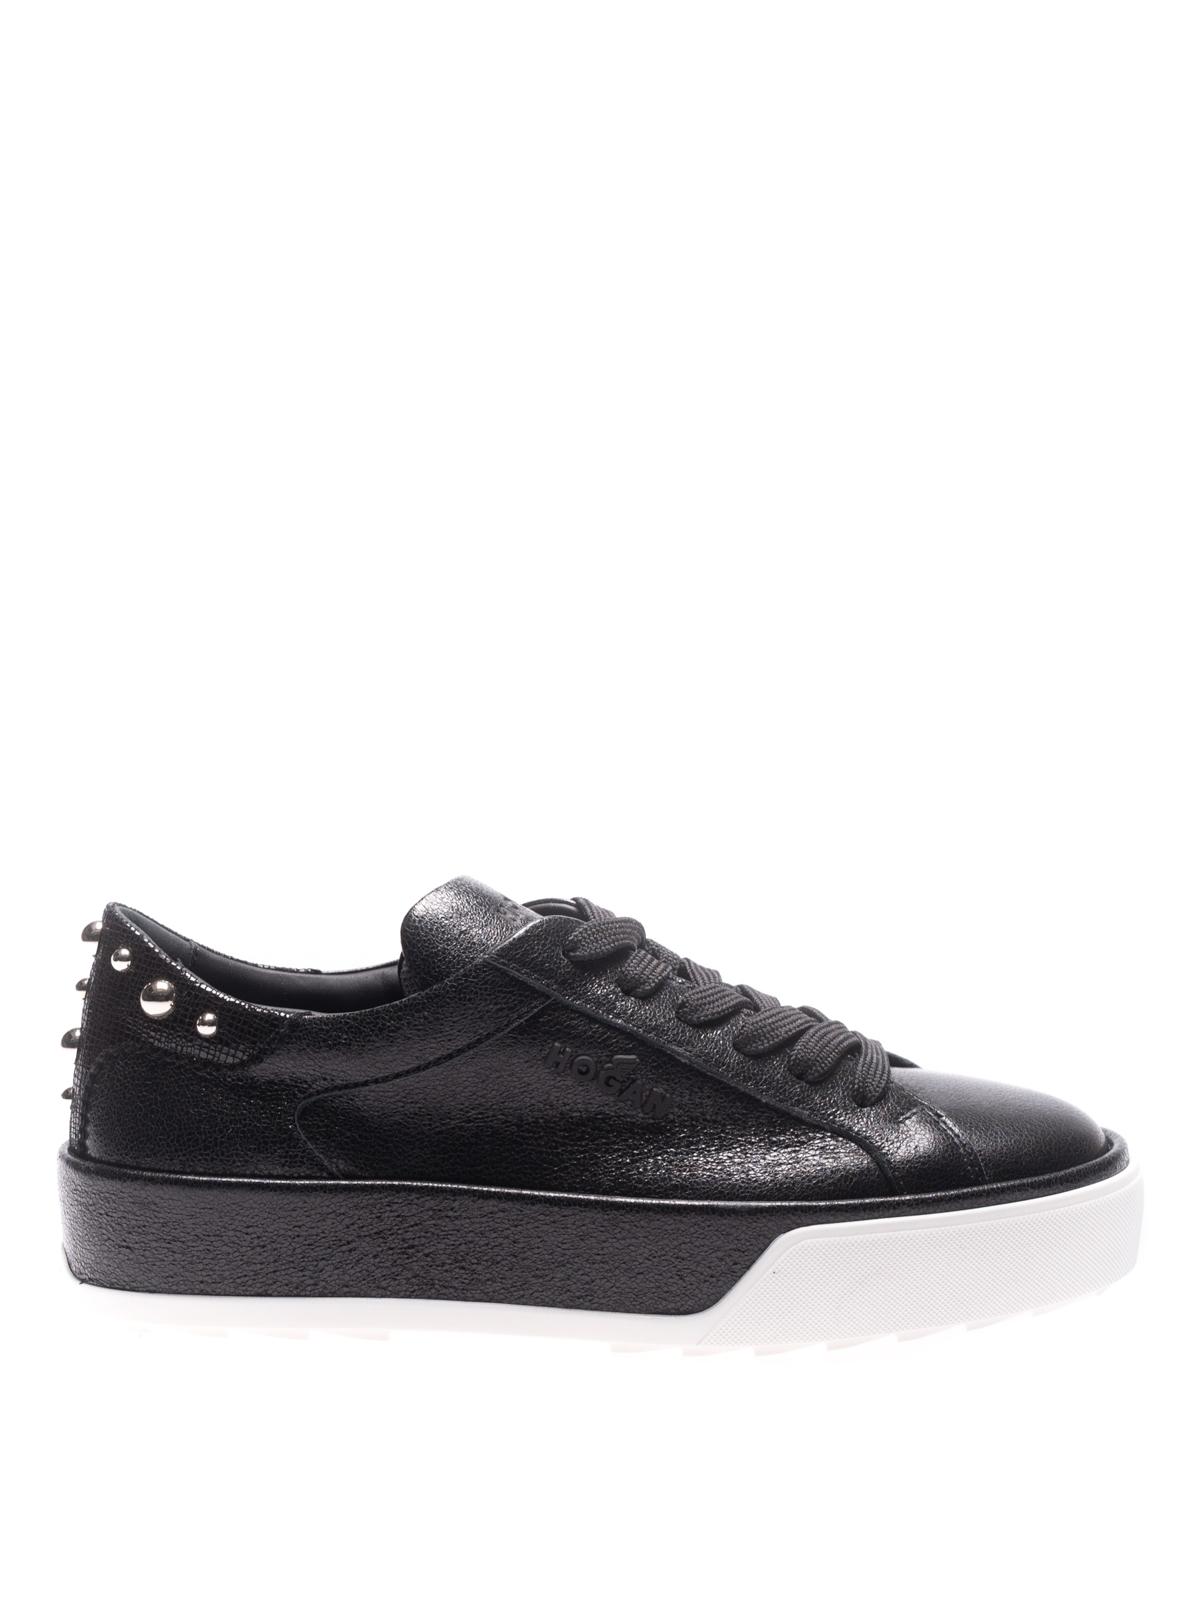 Sneakers Hogan - Sneaker nere in pelle con borchie ...